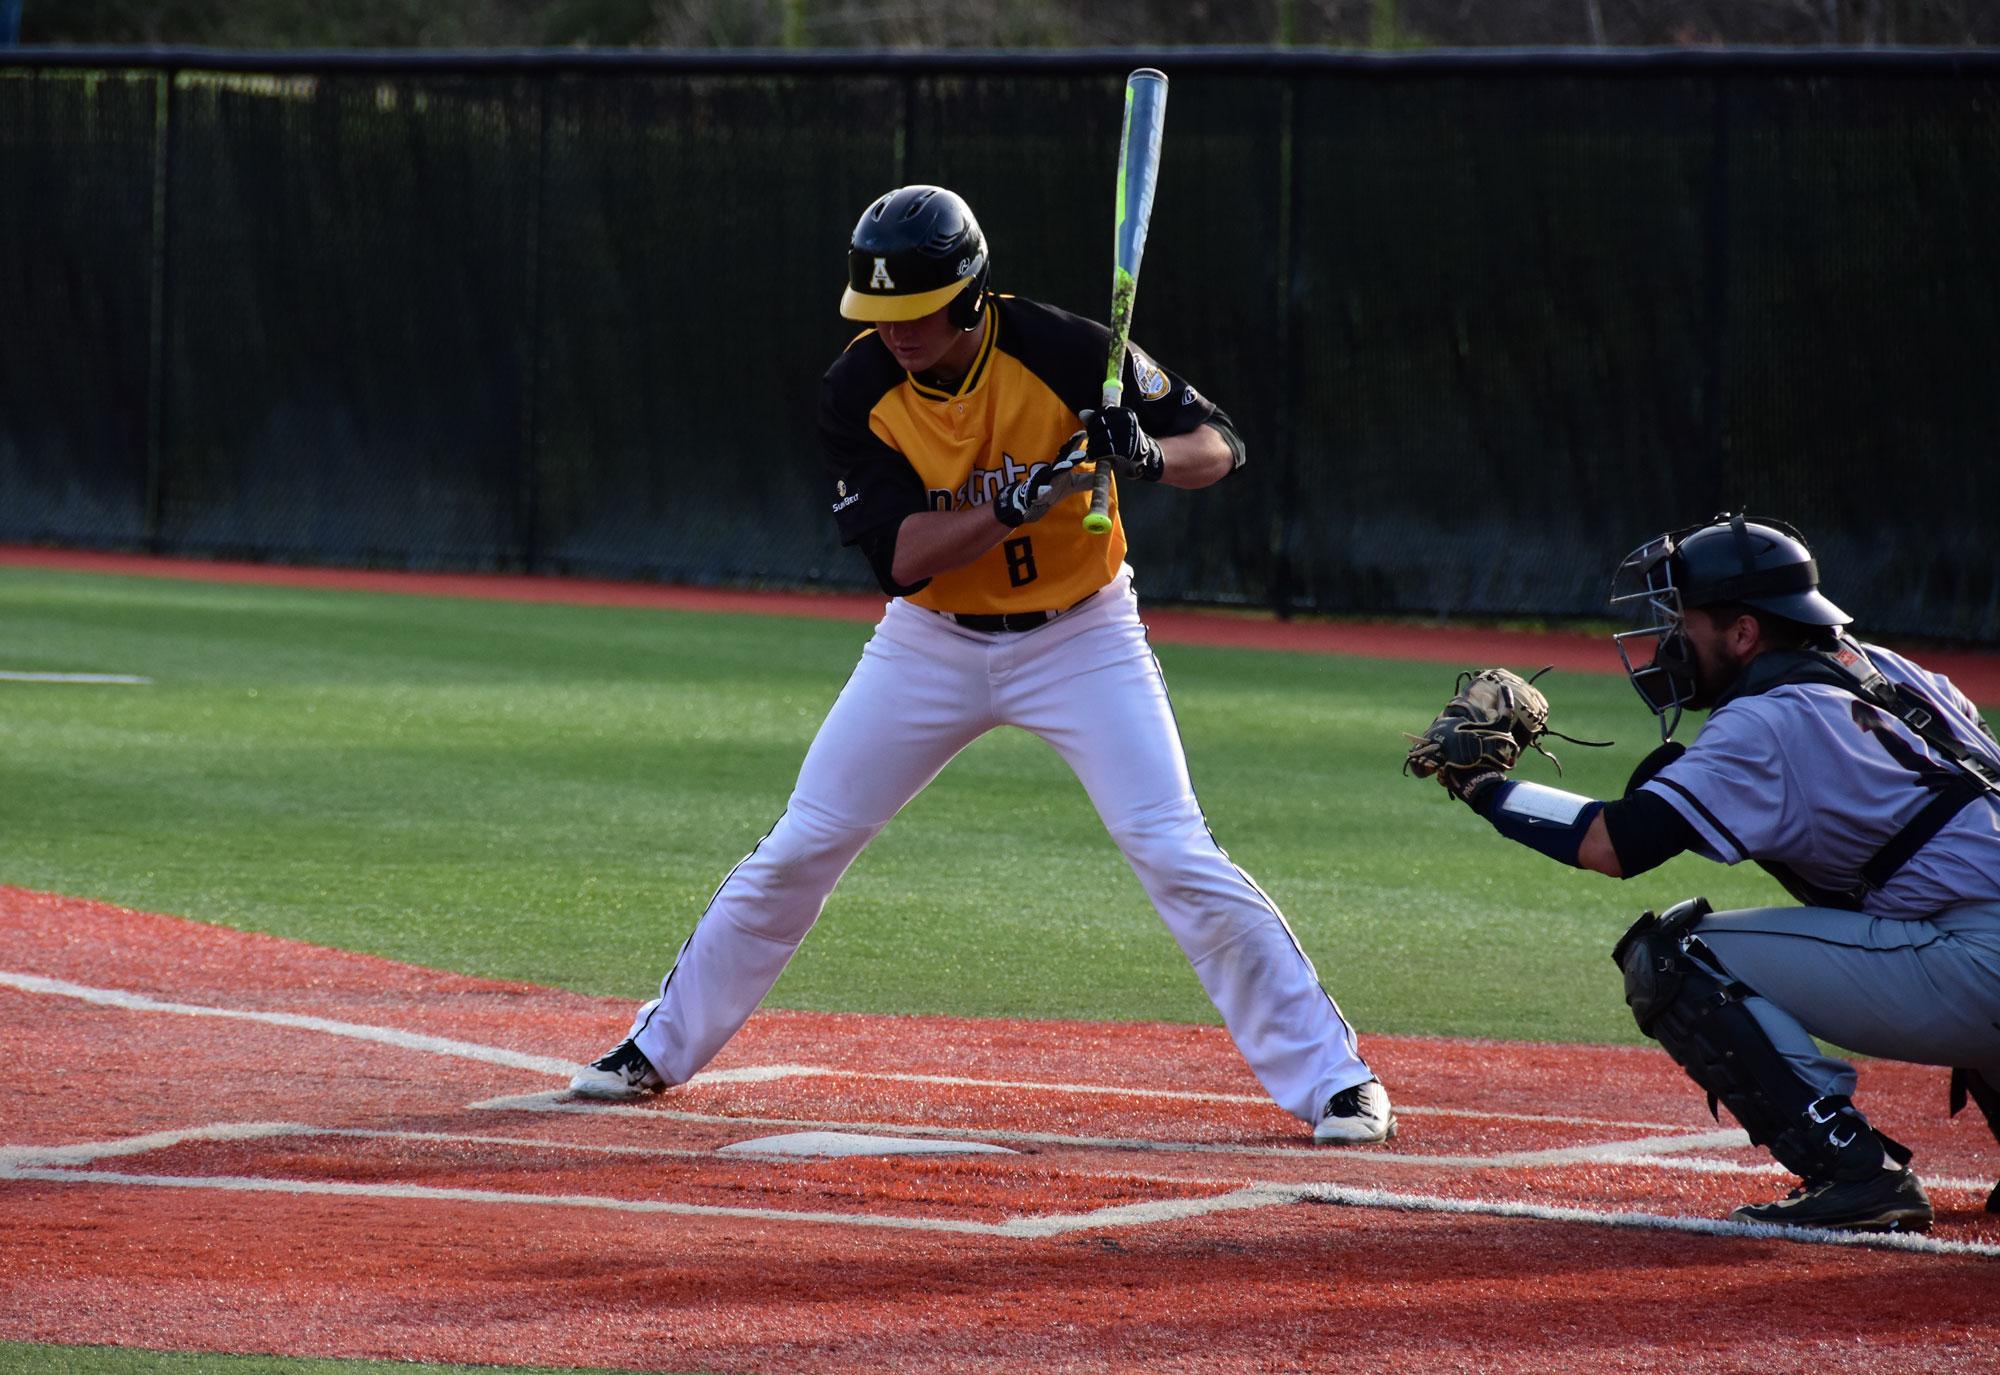 Senior Brain Bauk up to bat, ready to hit the ball during a home game last season.